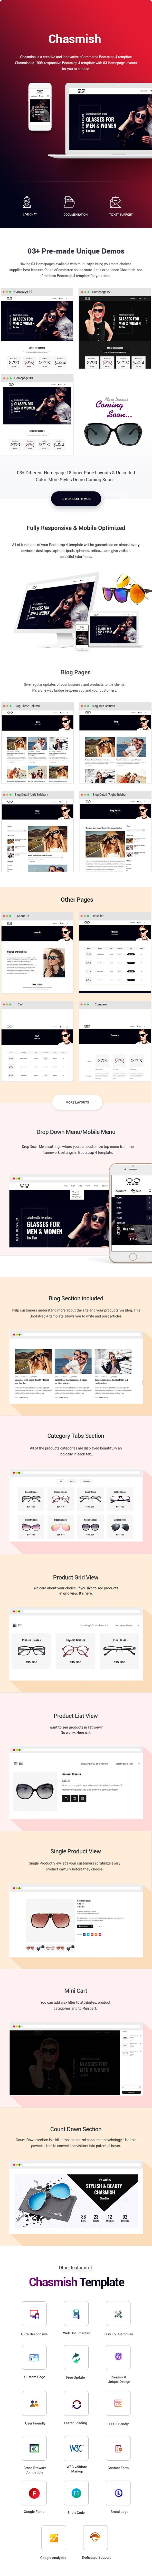 Chasmish - Glasses Store HTML Template - 1